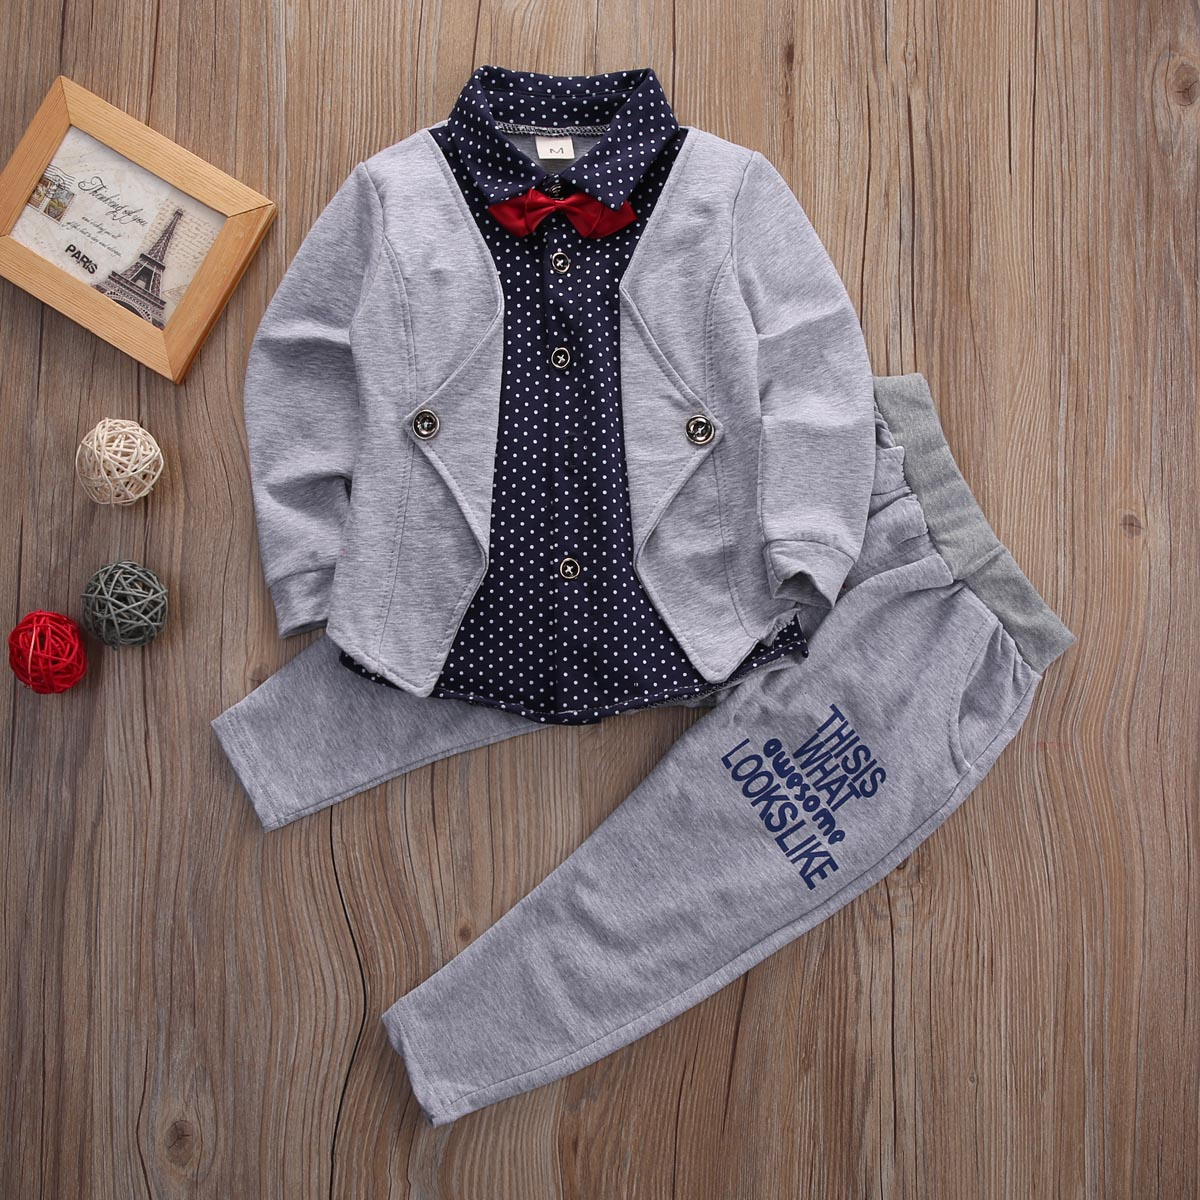 Toddler Kids Baby Boys Cardigan Shirt Tops Long Pants Gentleman Clothes Outfits